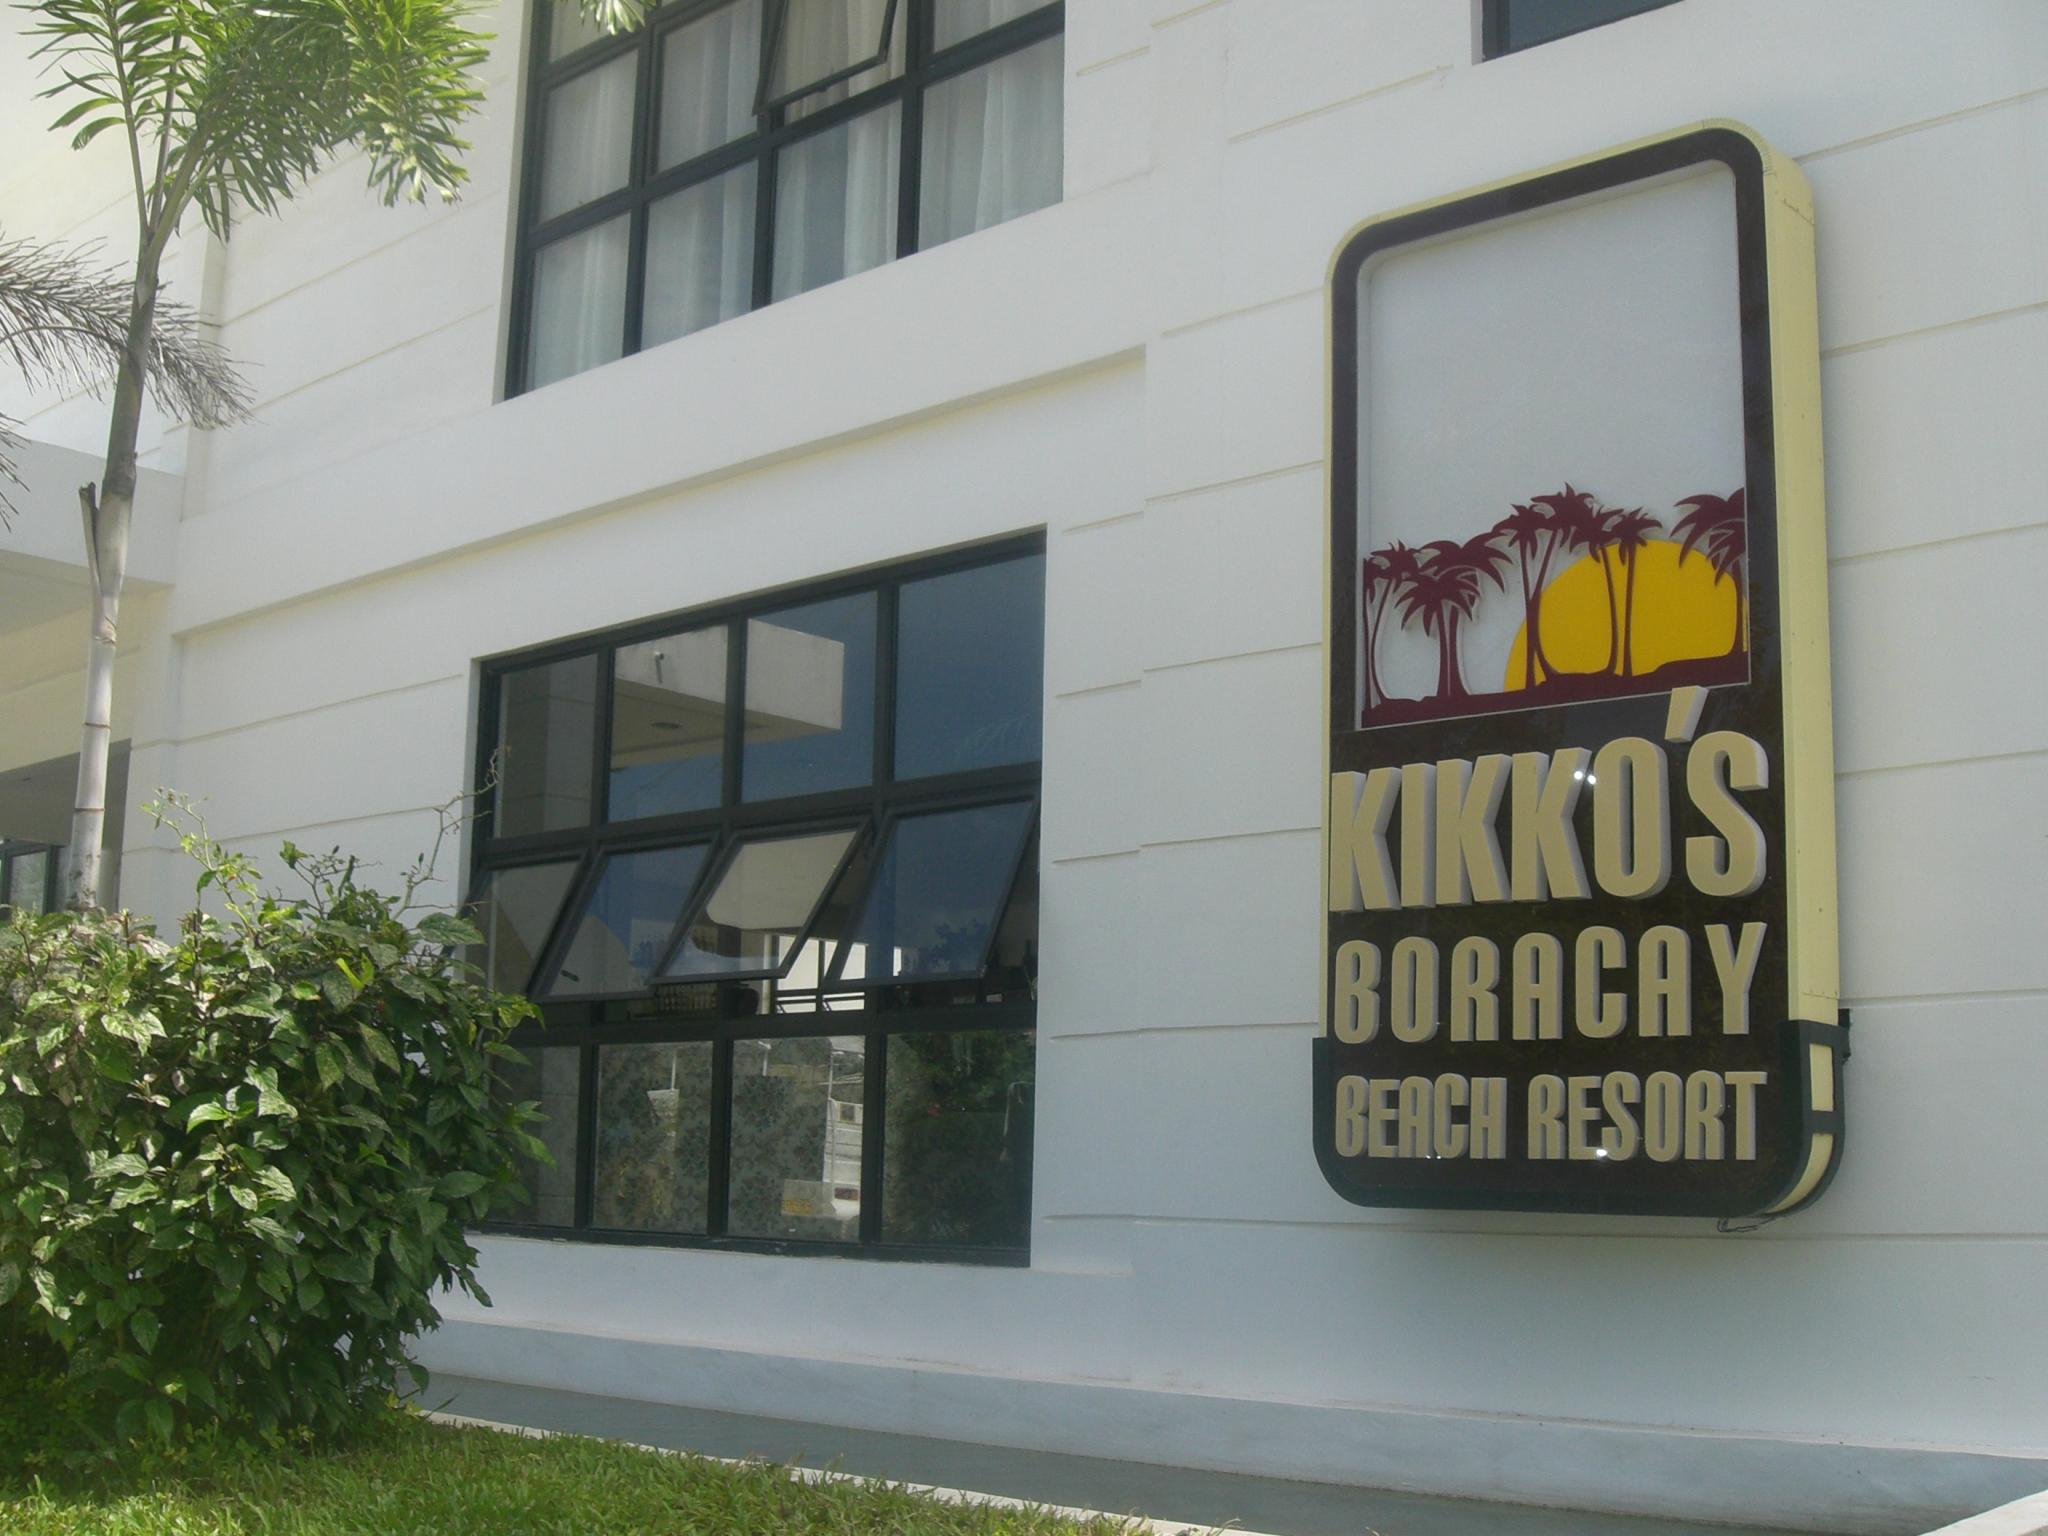 Kikko's Boracay Beach Resort